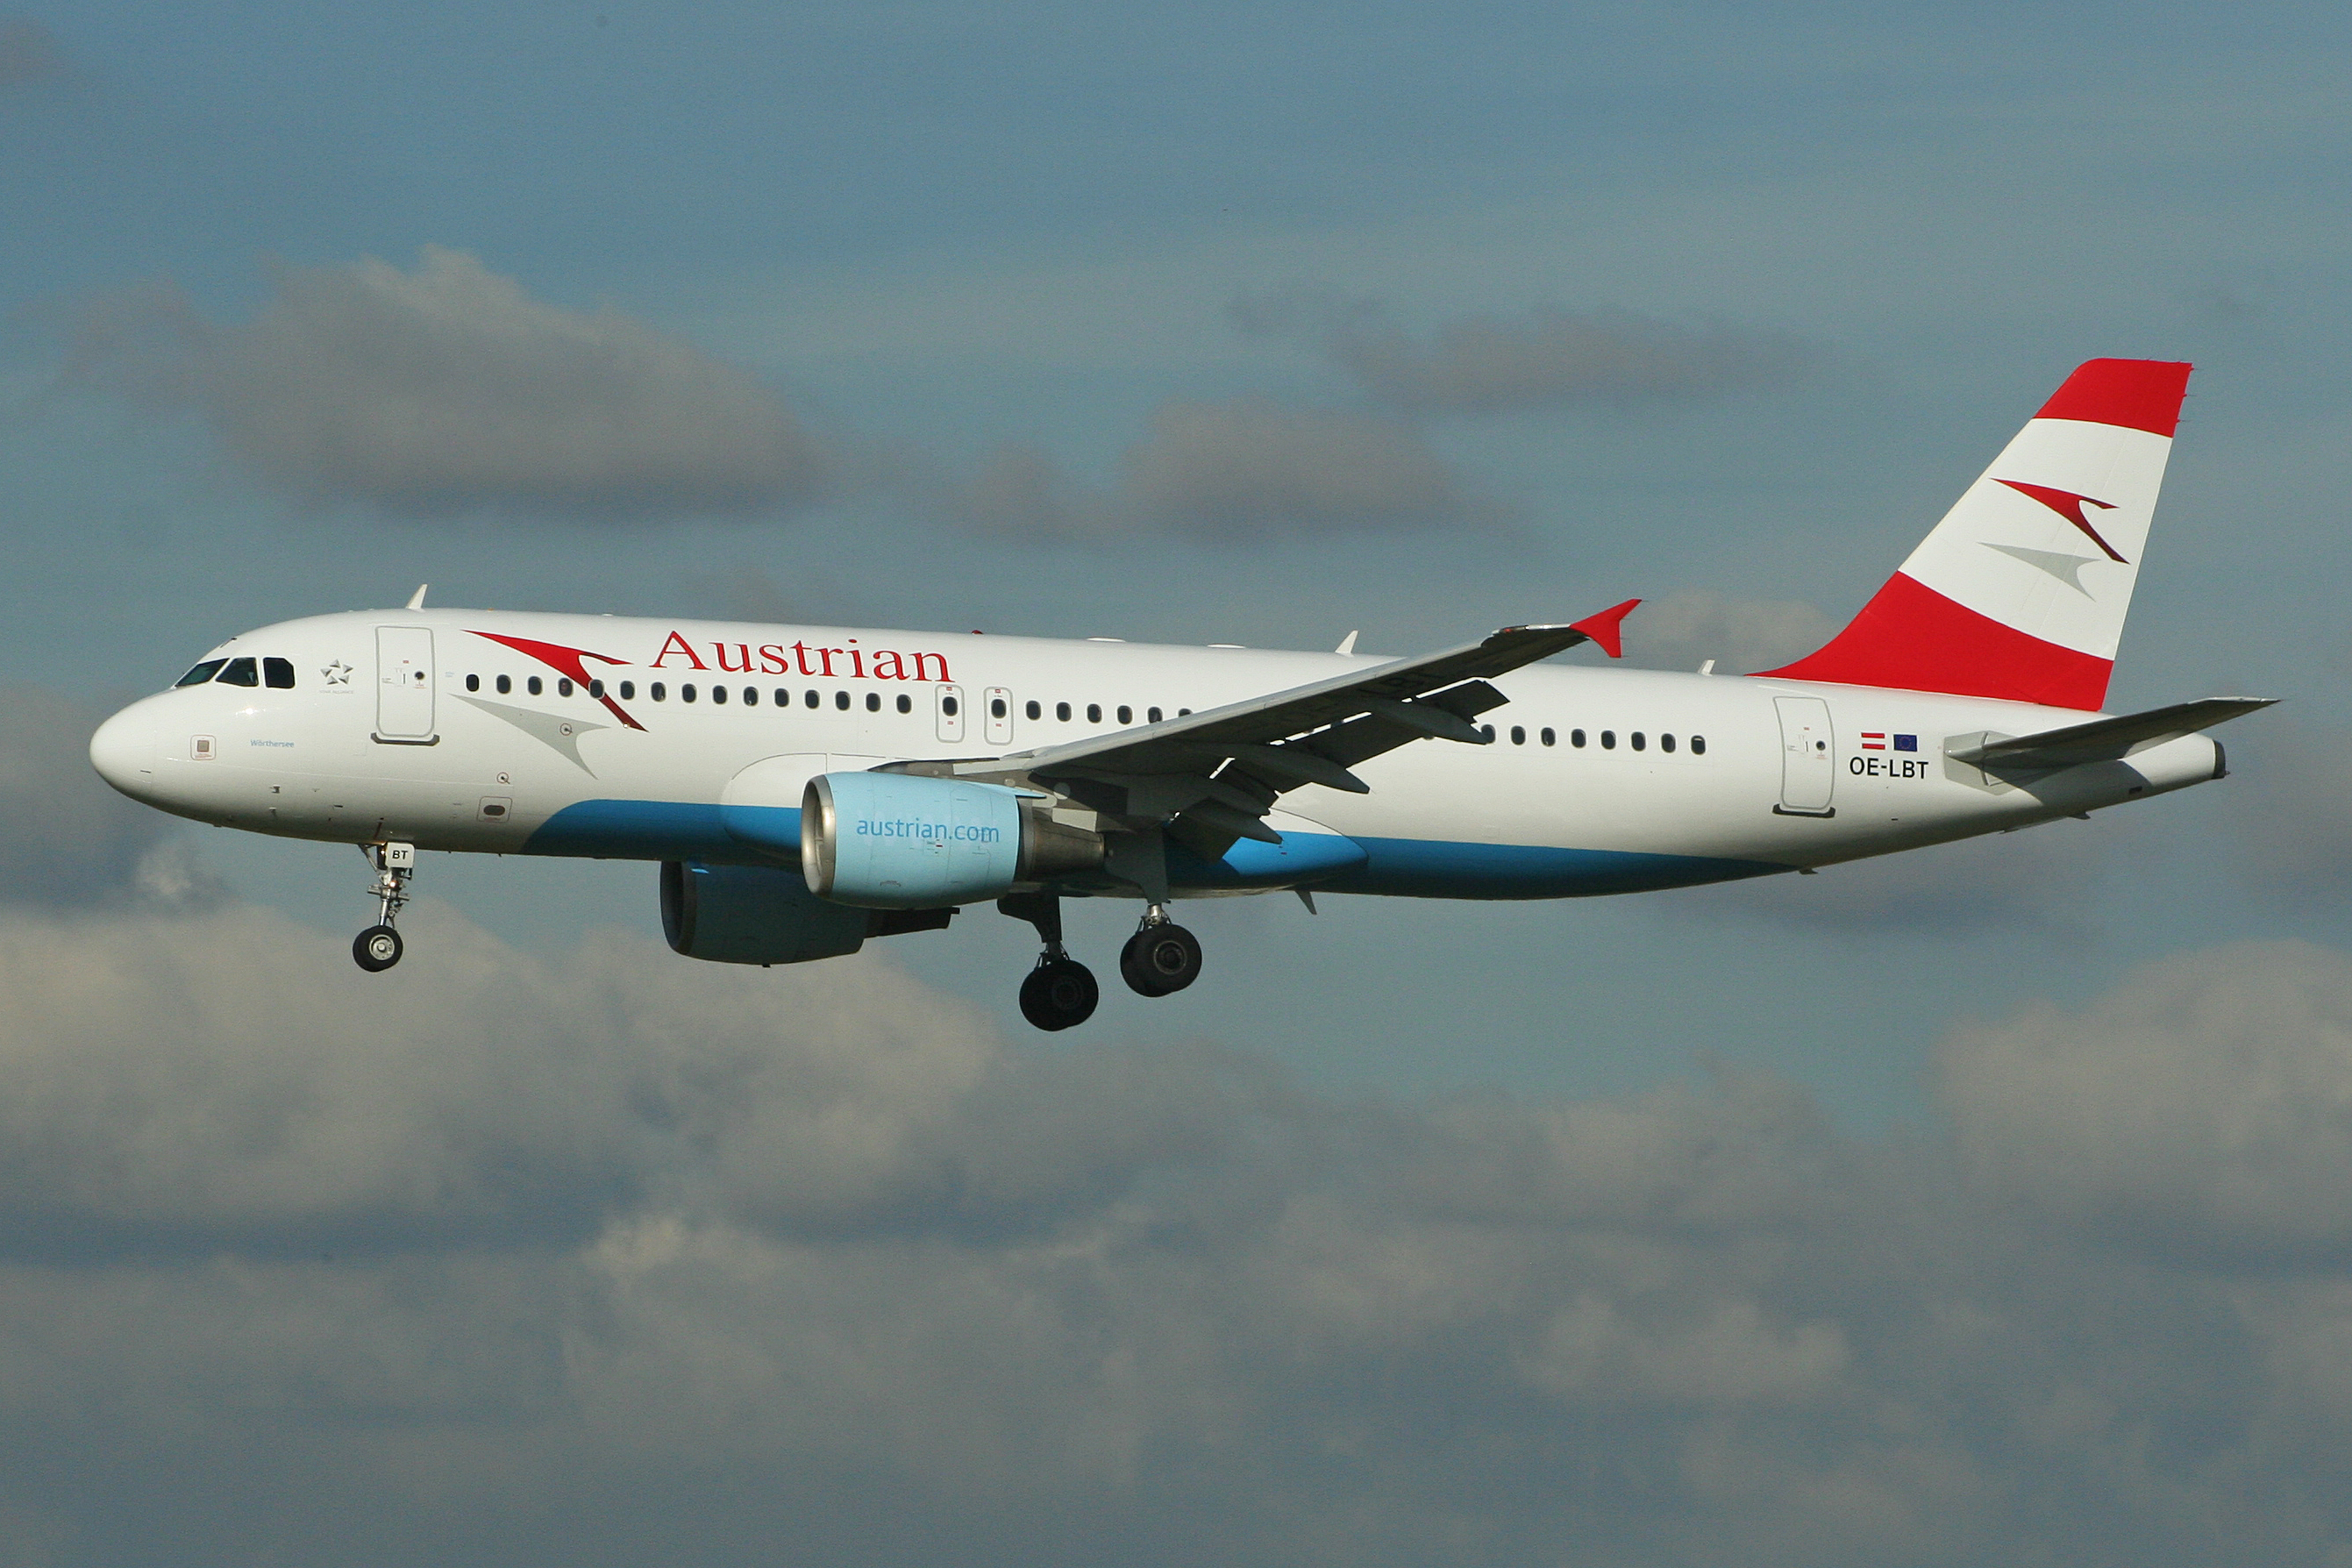 Airbus_A320-214_OE-LBT_Austrian_Airlines